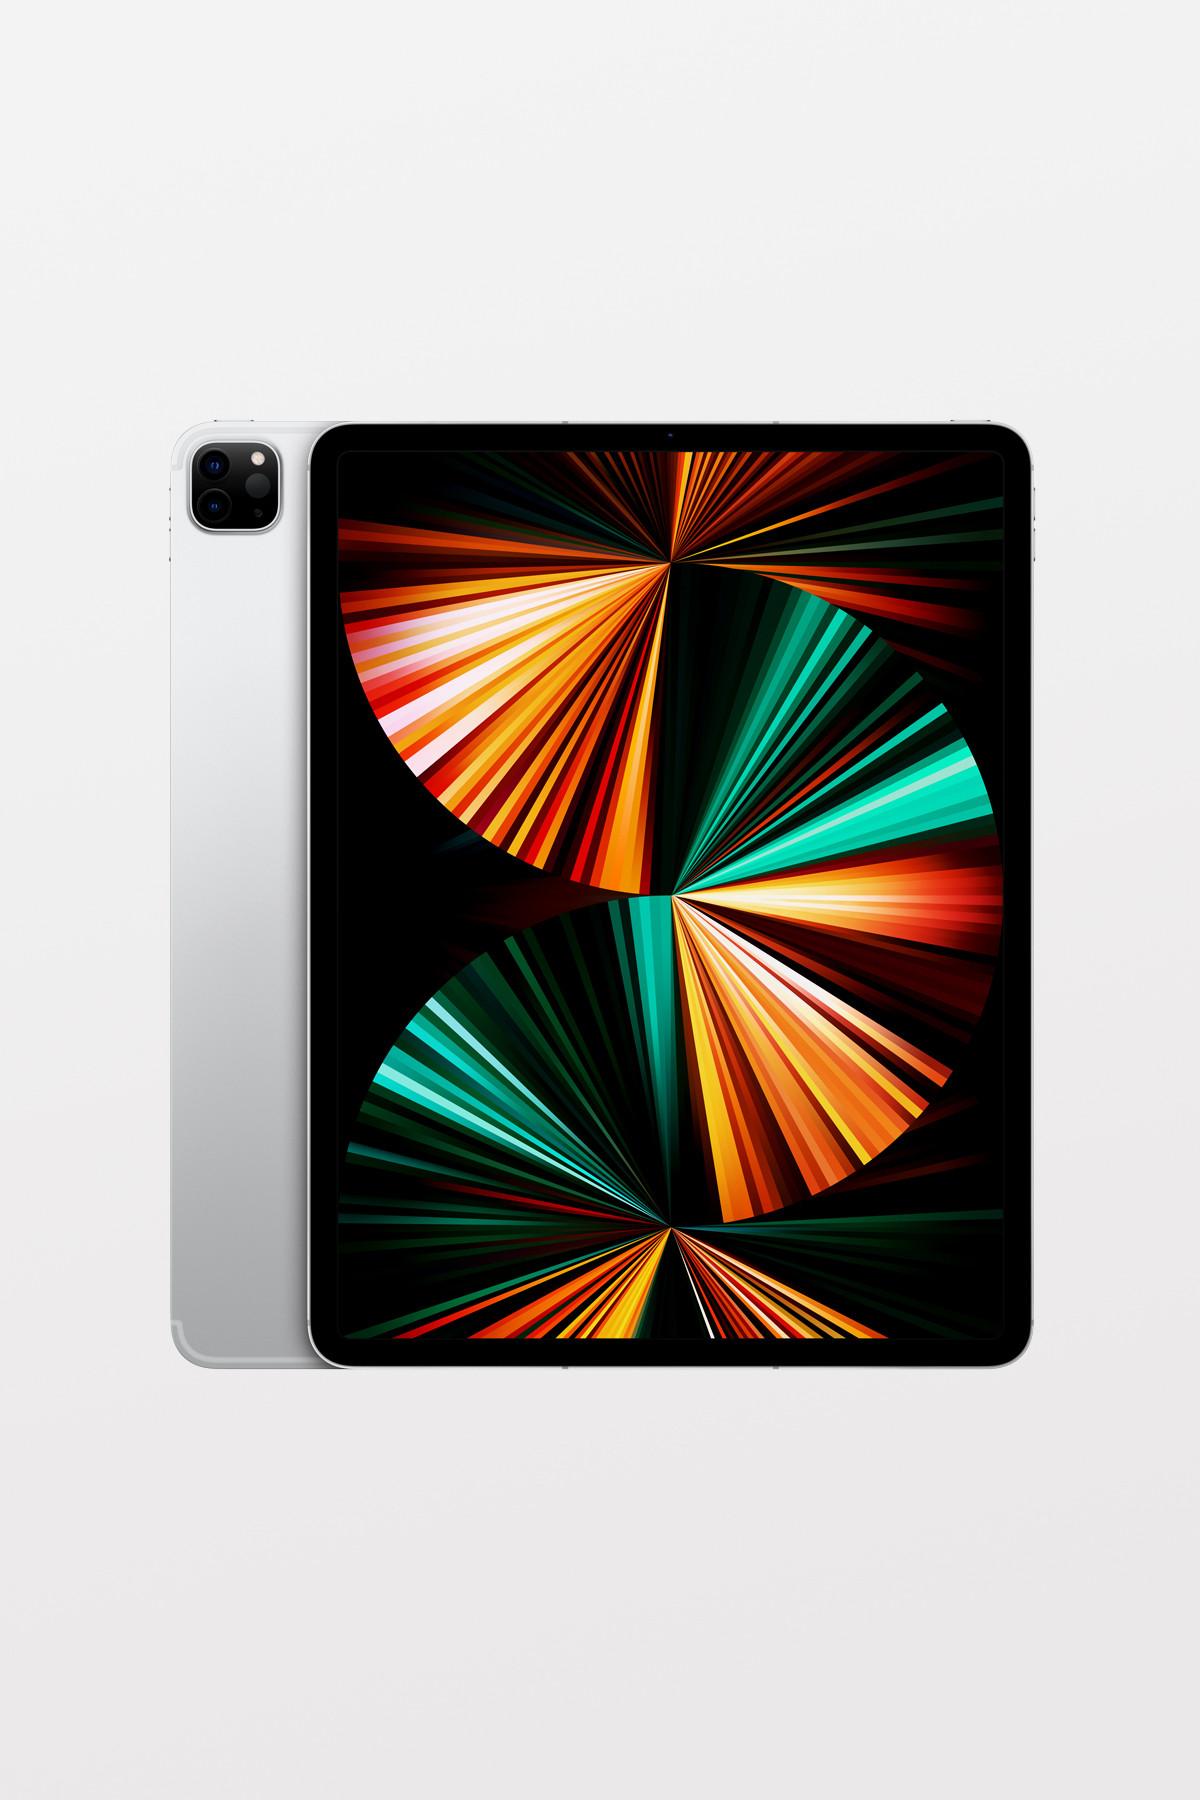 iPad Pro 12.9 (5GEN) WI-FI + Cellular 2TB Silver